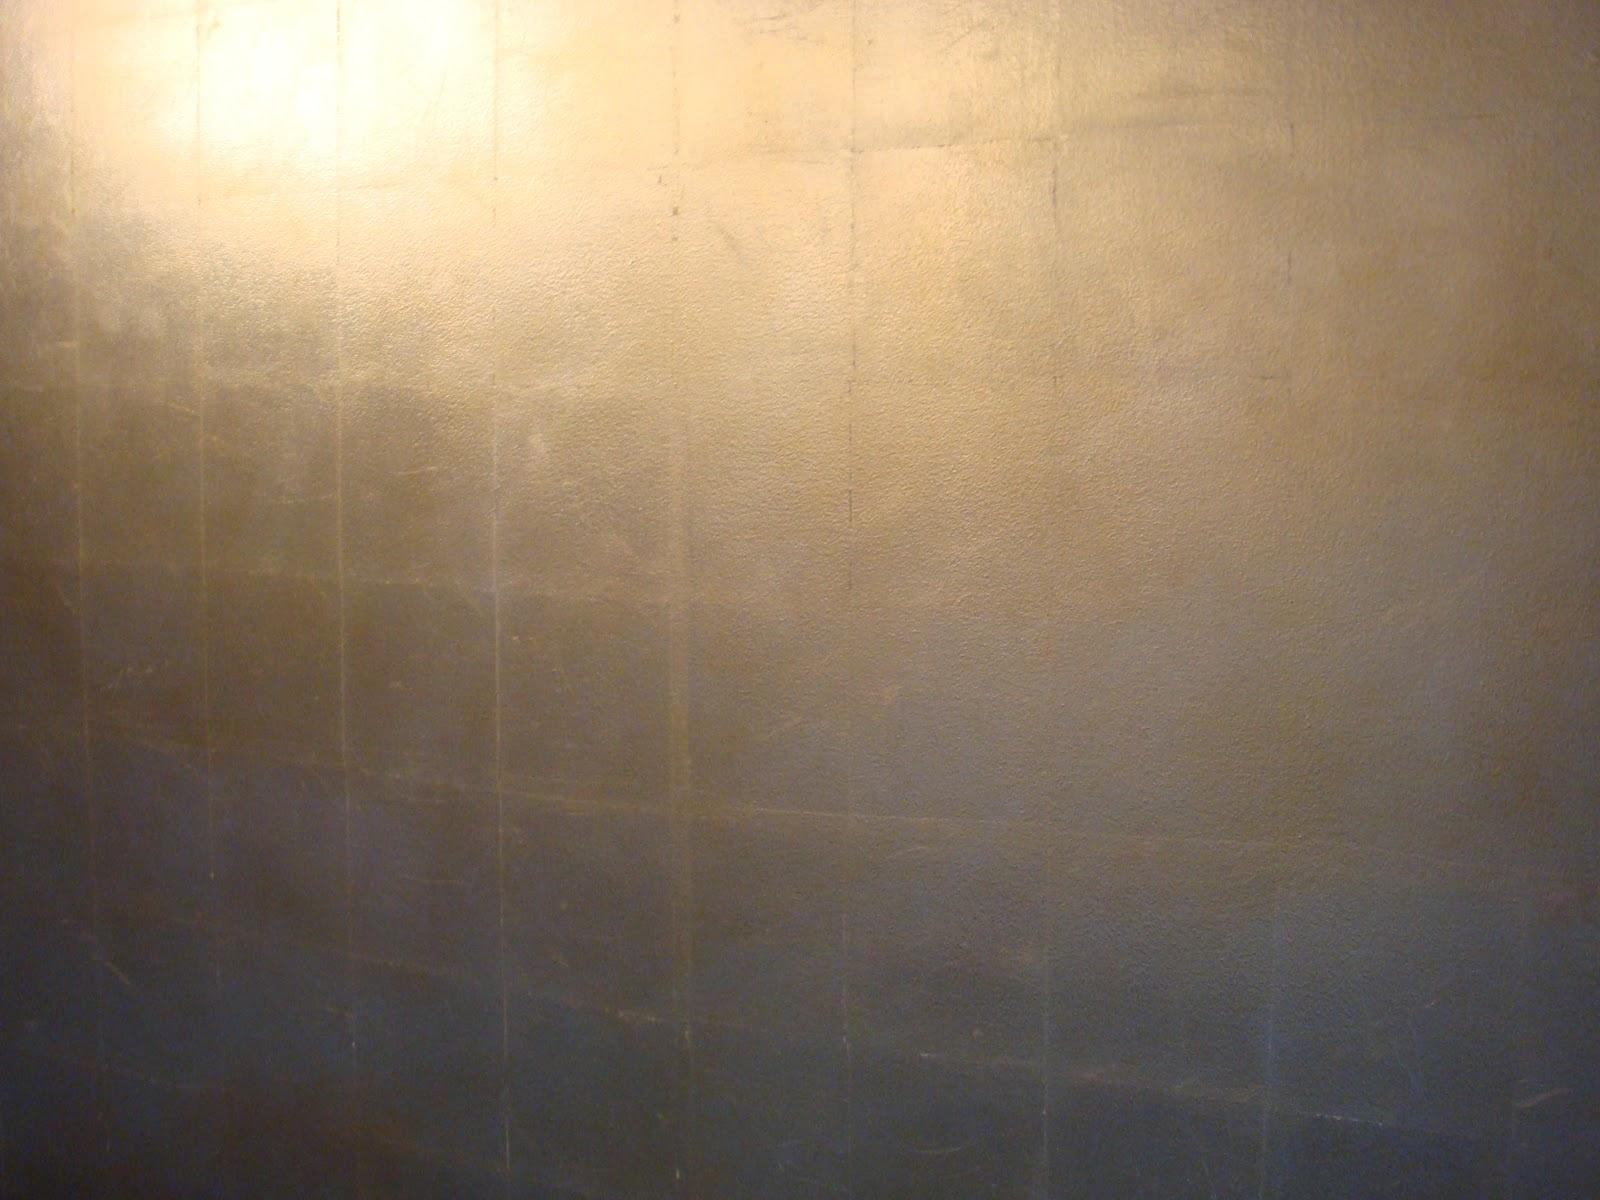 Silver Leaf Wallpaper Gold silver copper leaf 1600x1200